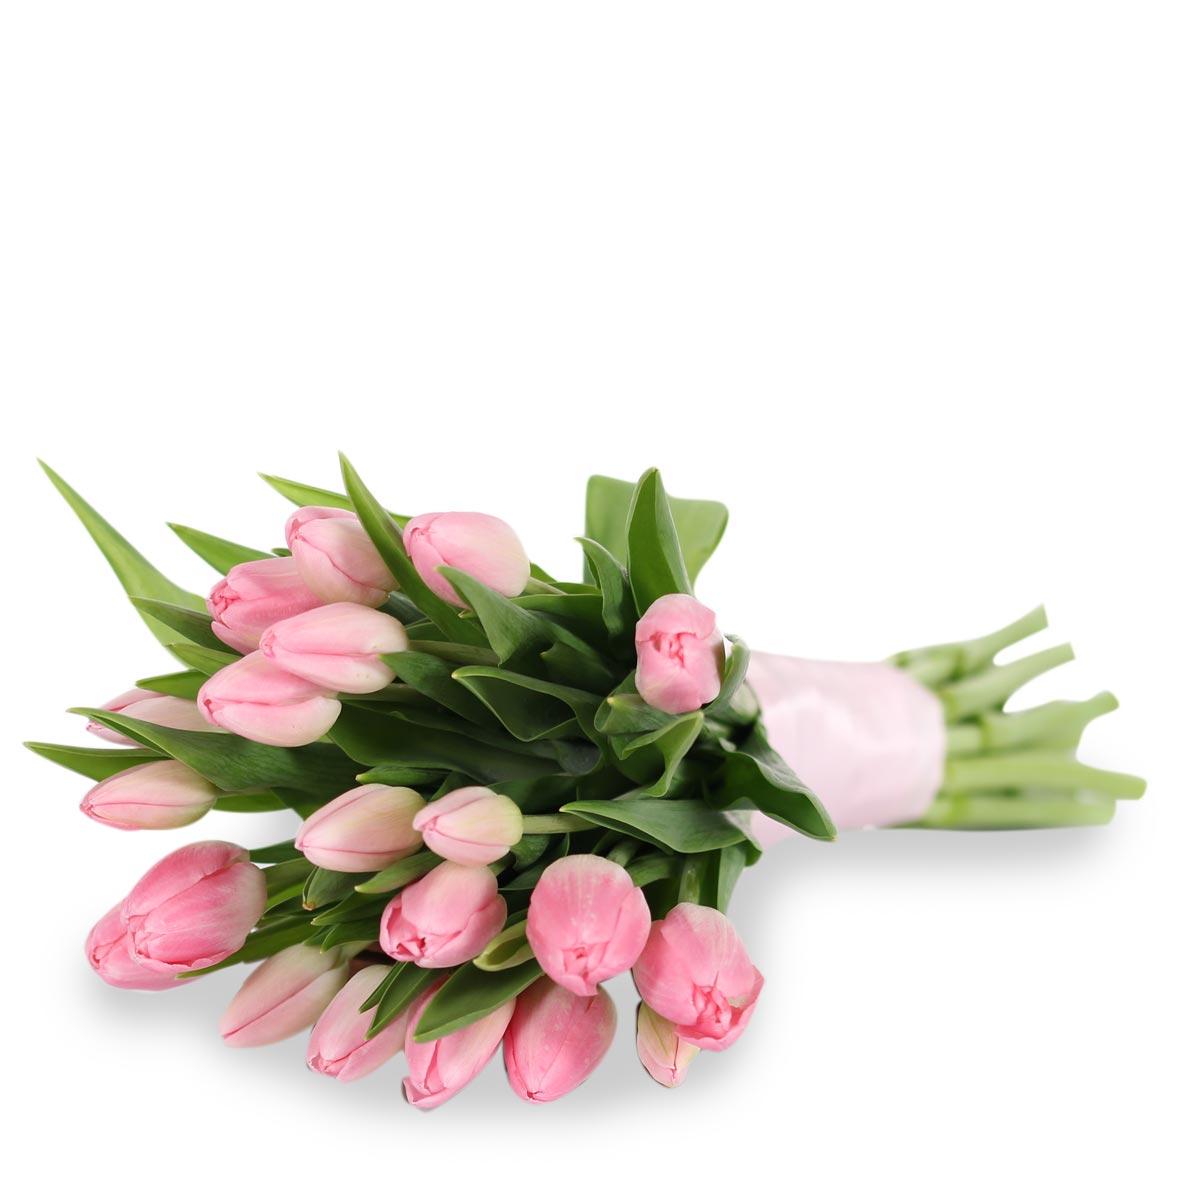 wb1618-pink-tulip-bridal-bouquet0675c0a8350a62b6a920ff0000e4902b